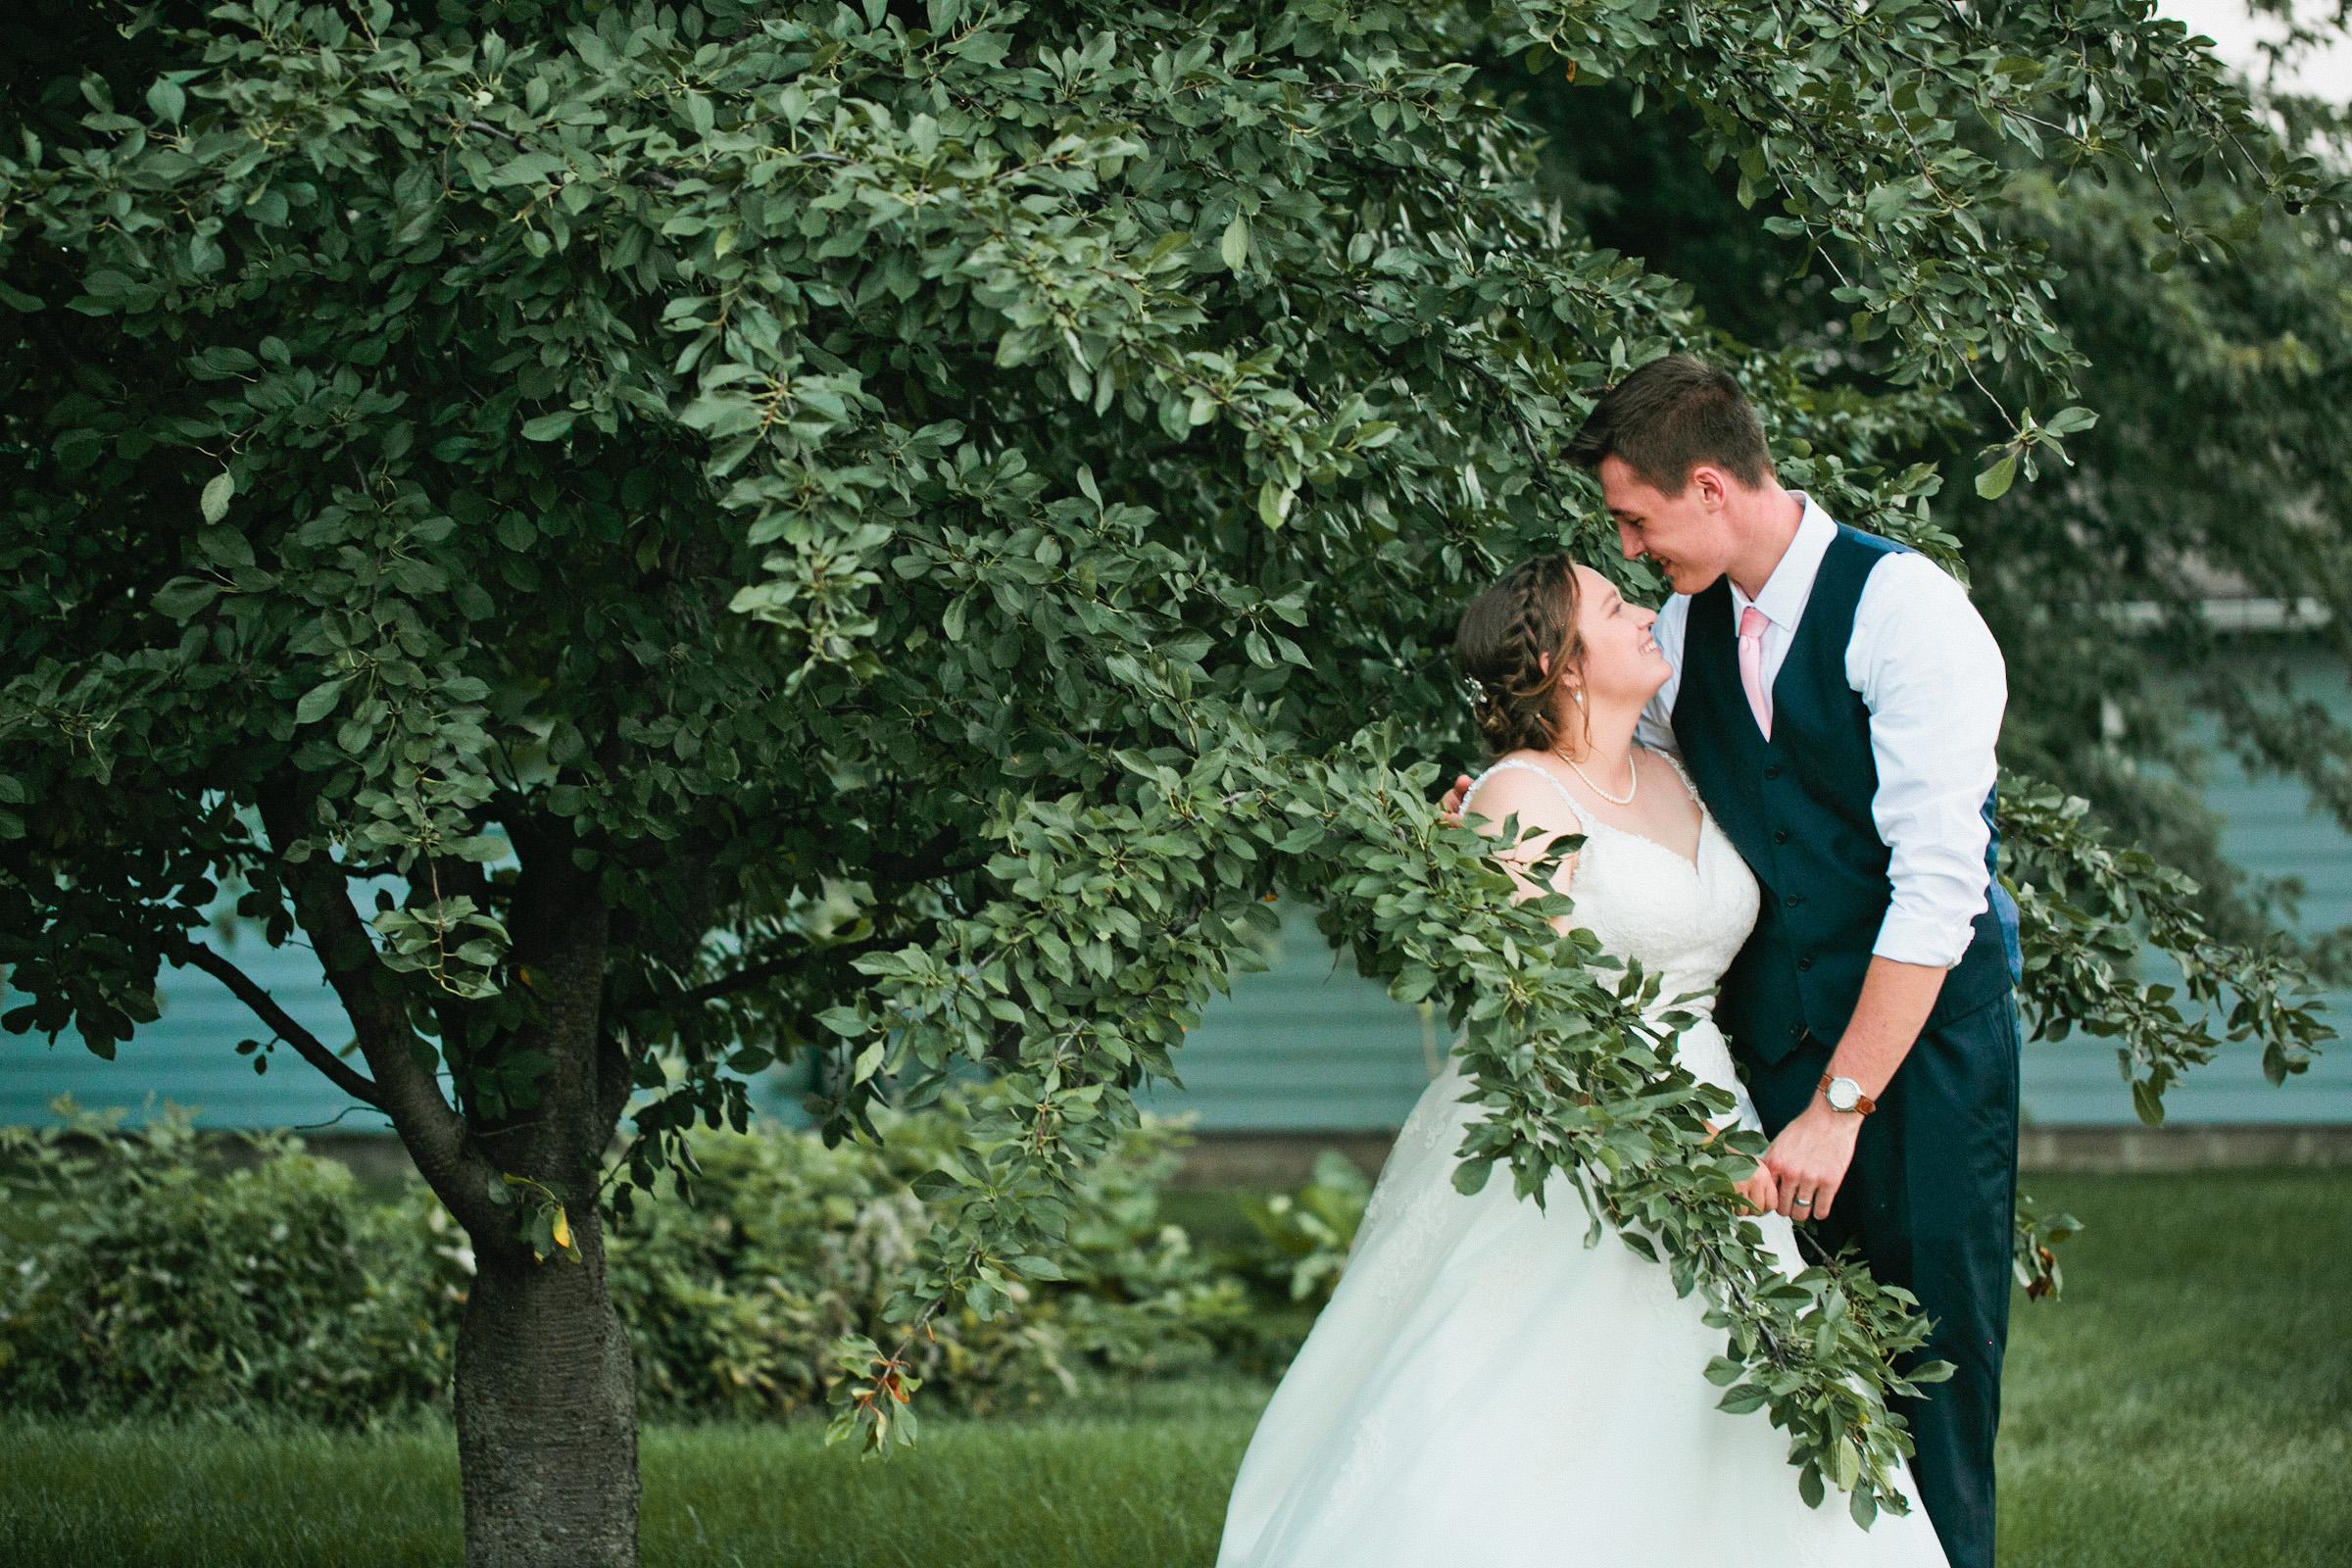 amelia_renee_photography_wedding_photographers_des_moines